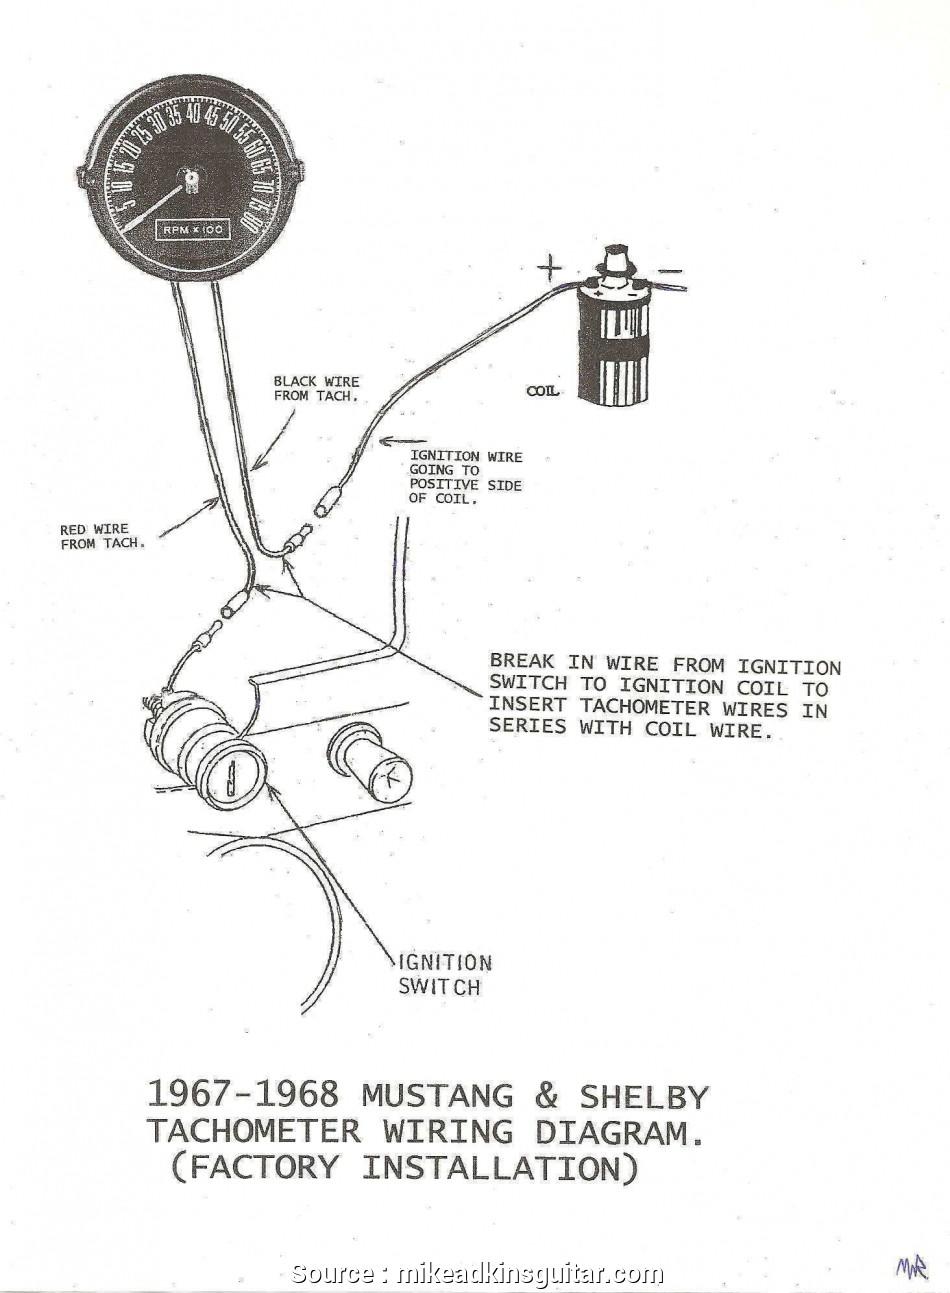 Monster Tacho Wiring Diagram